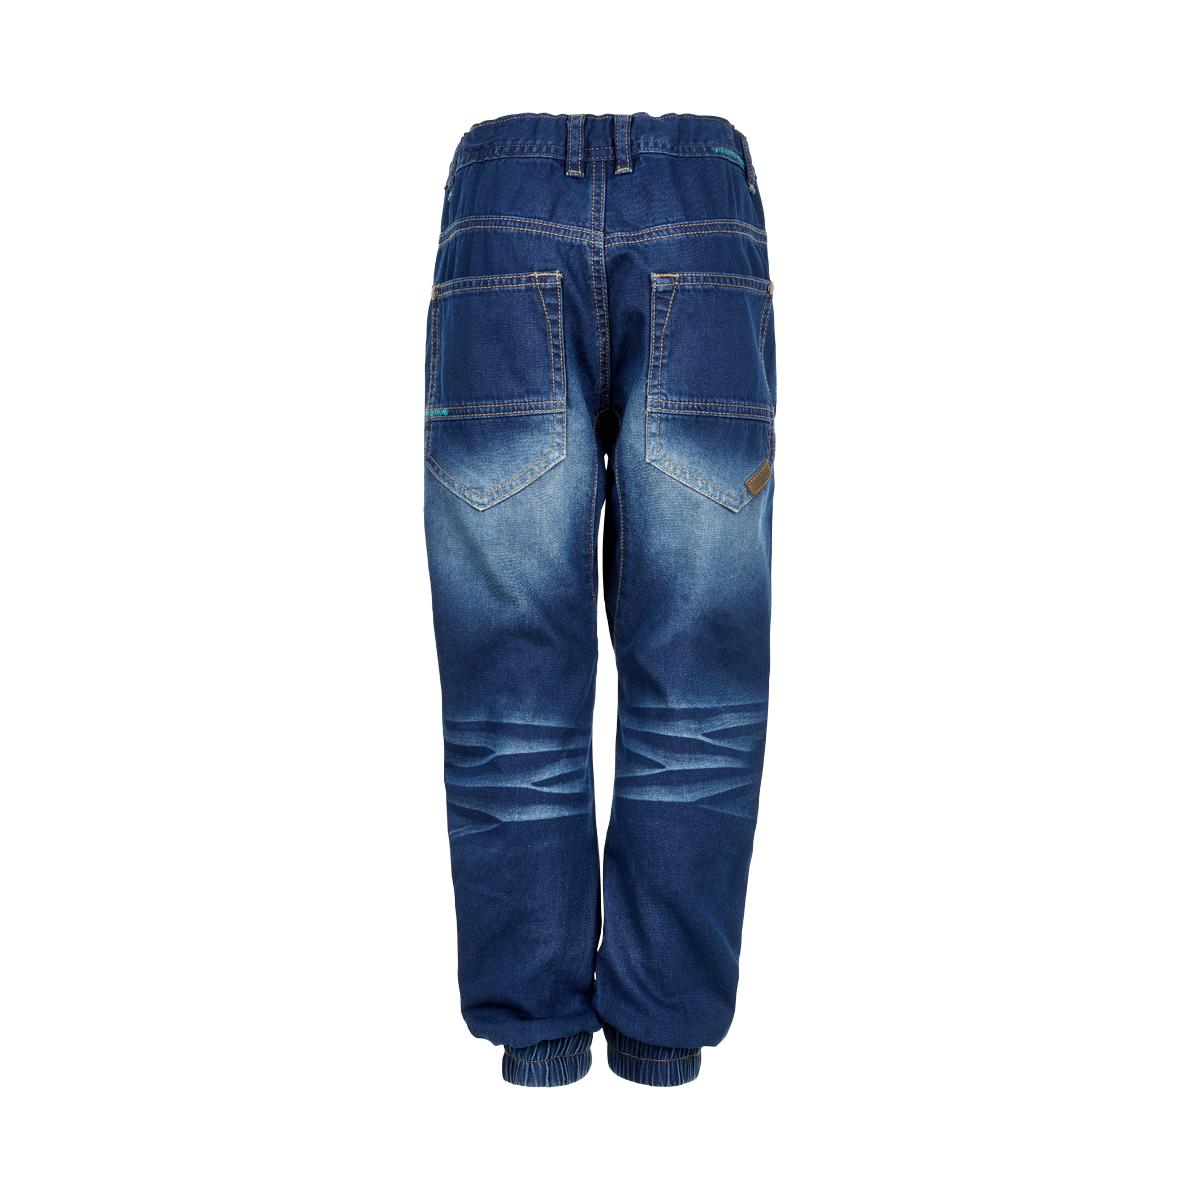 c3b104eb275 Mike 373 Jeans Baggy Blue Denim Barn Me Too abck ...